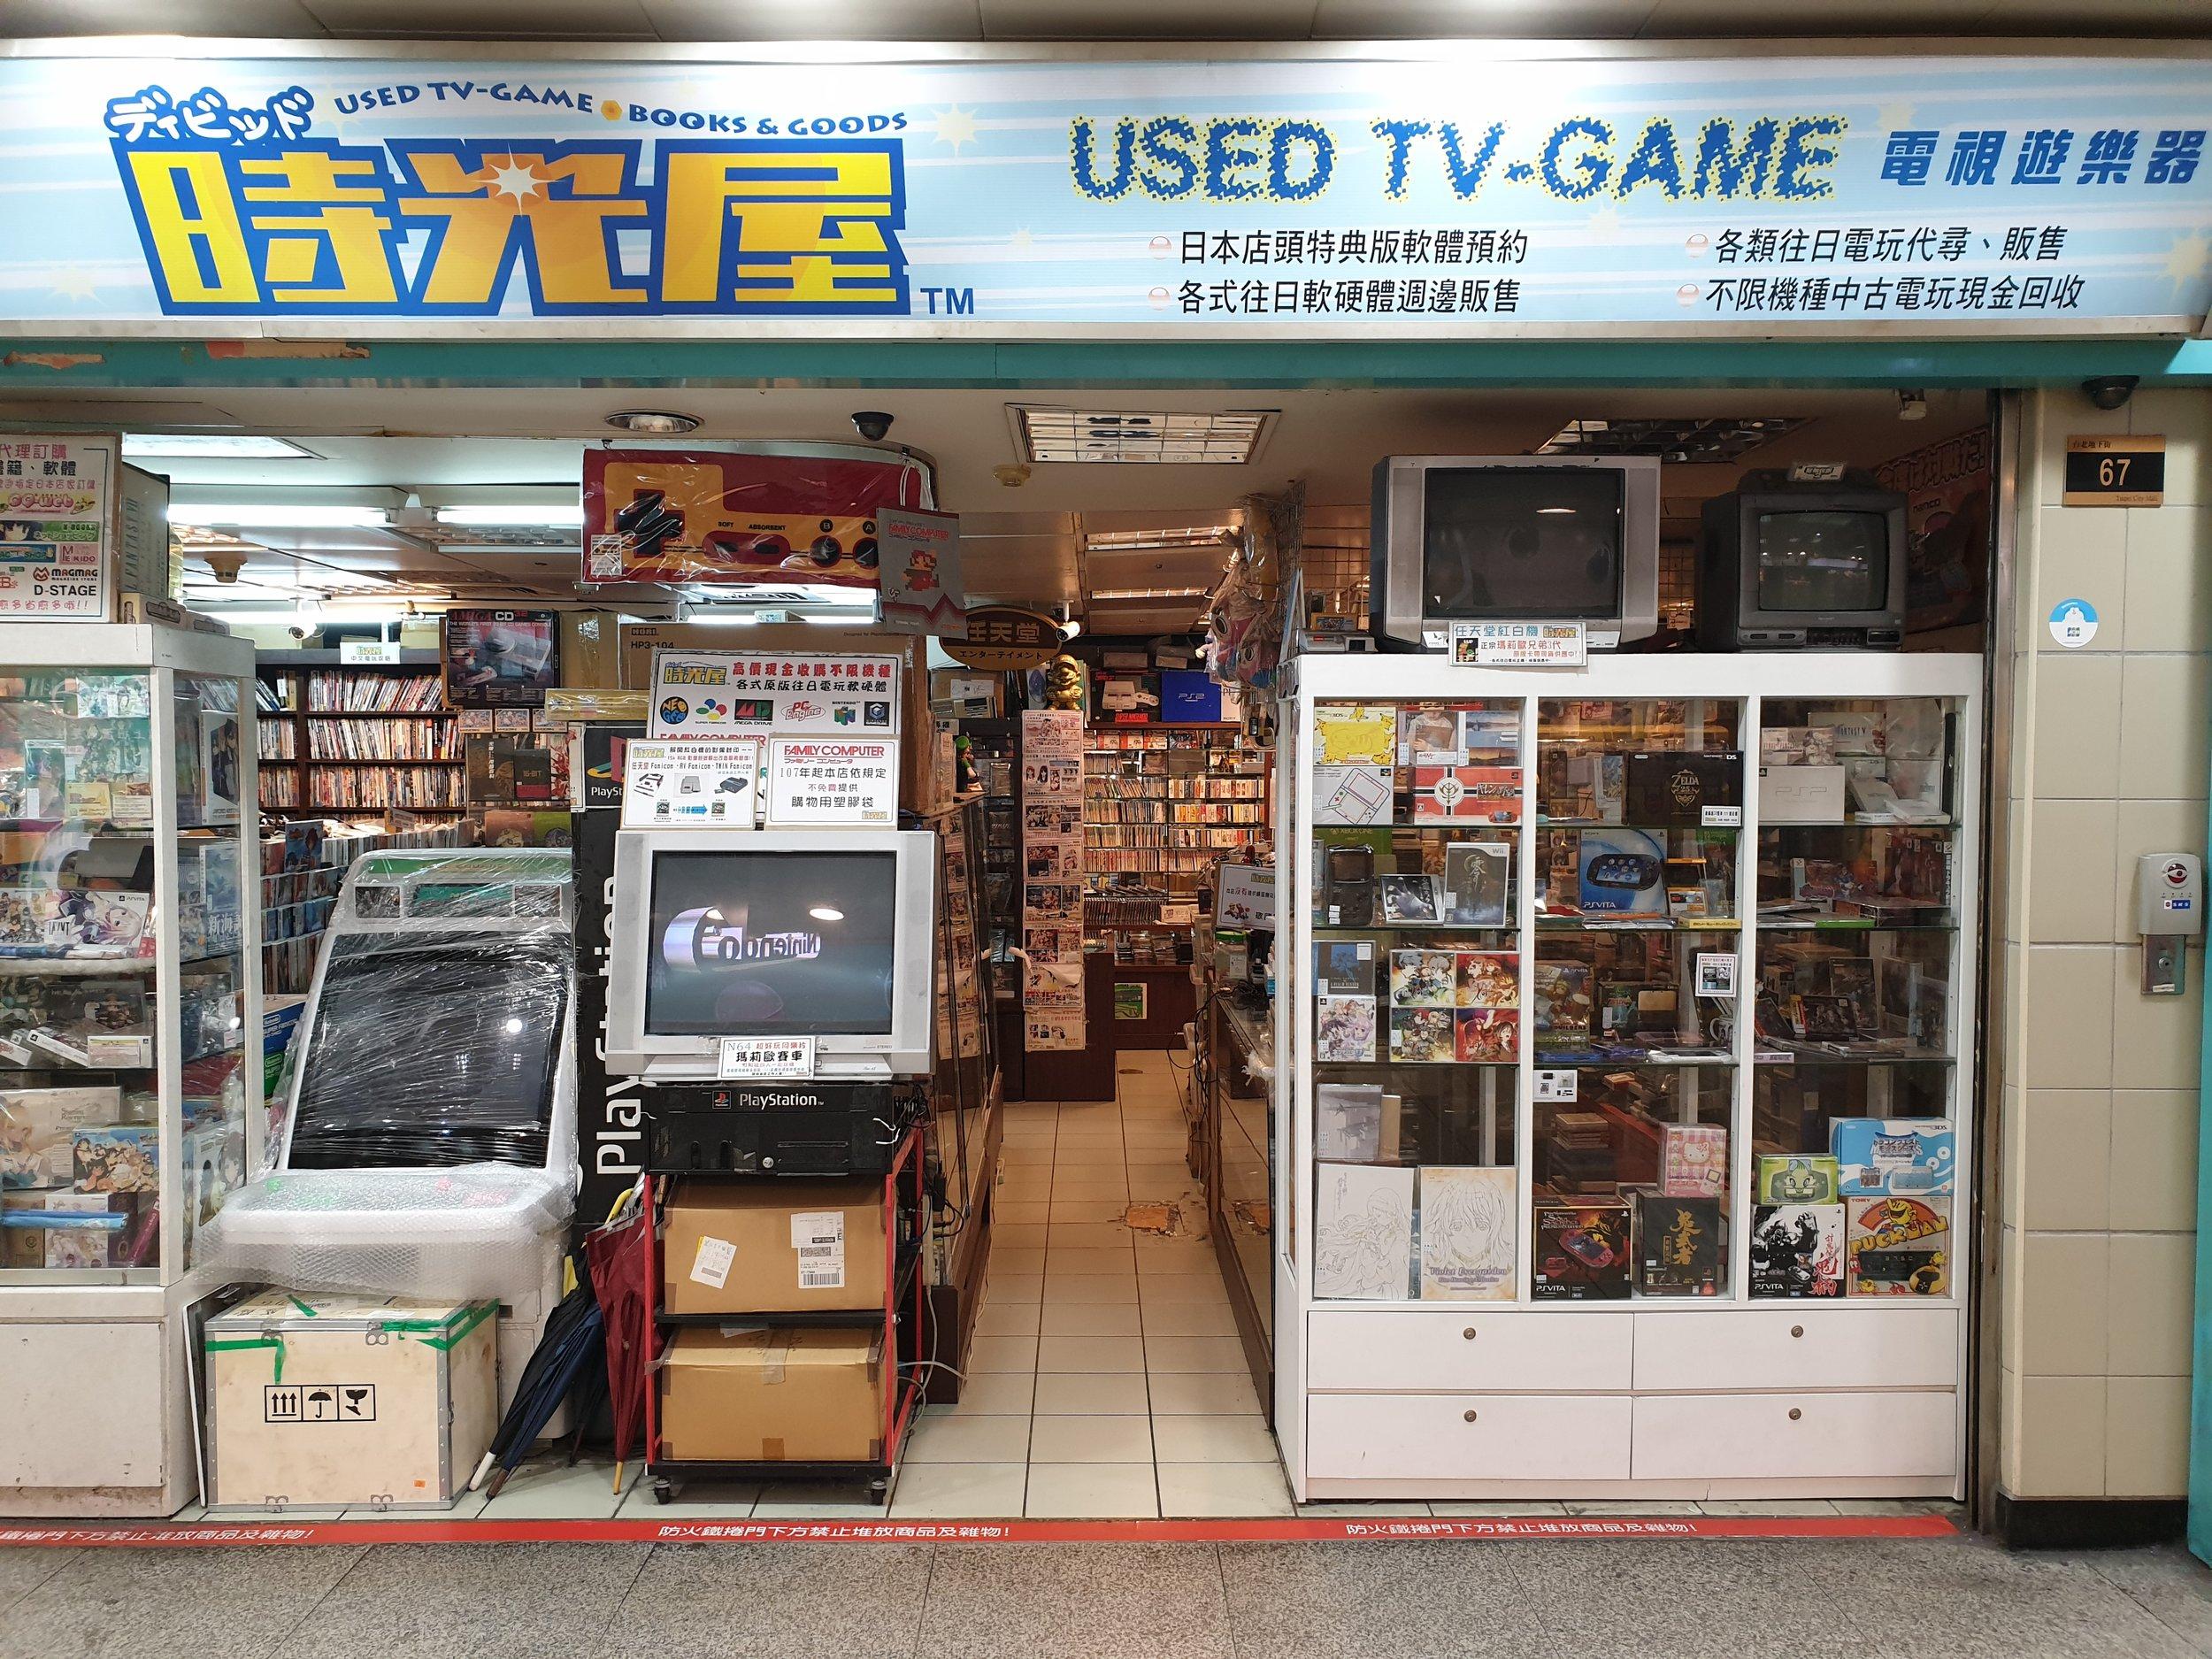 A bizarre Bin Laden action figure and retro gaming